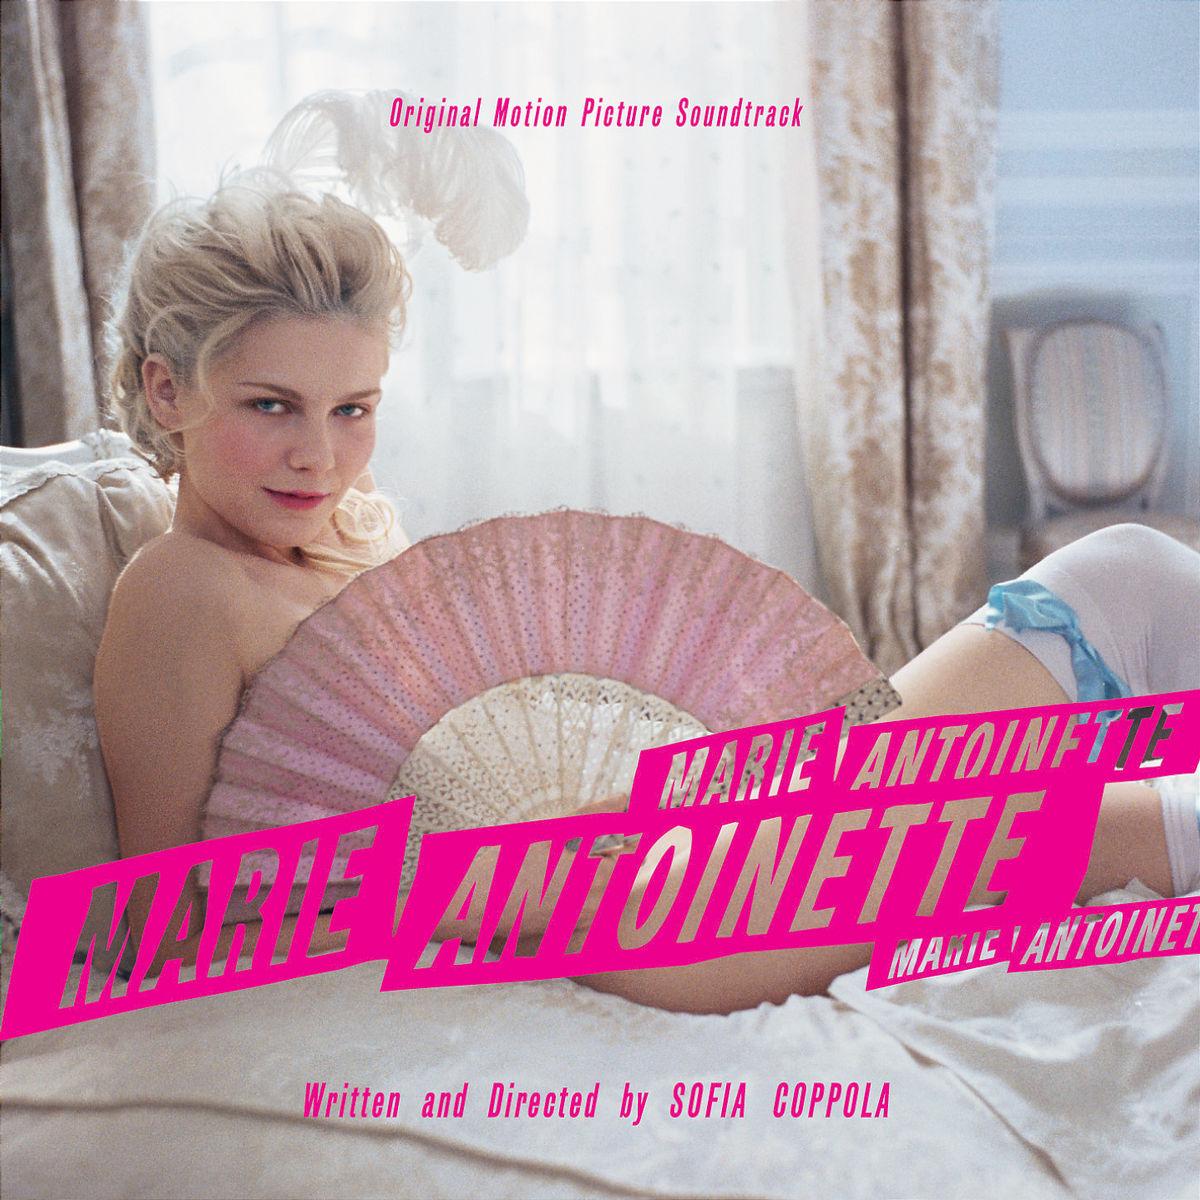 http://4.bp.blogspot.com/_dBvviwscKro/TIupEhG4J5I/AAAAAAAABqg/n7Qb507QF1E/s1600/Soundtrack_MarieAntoinette.jpg